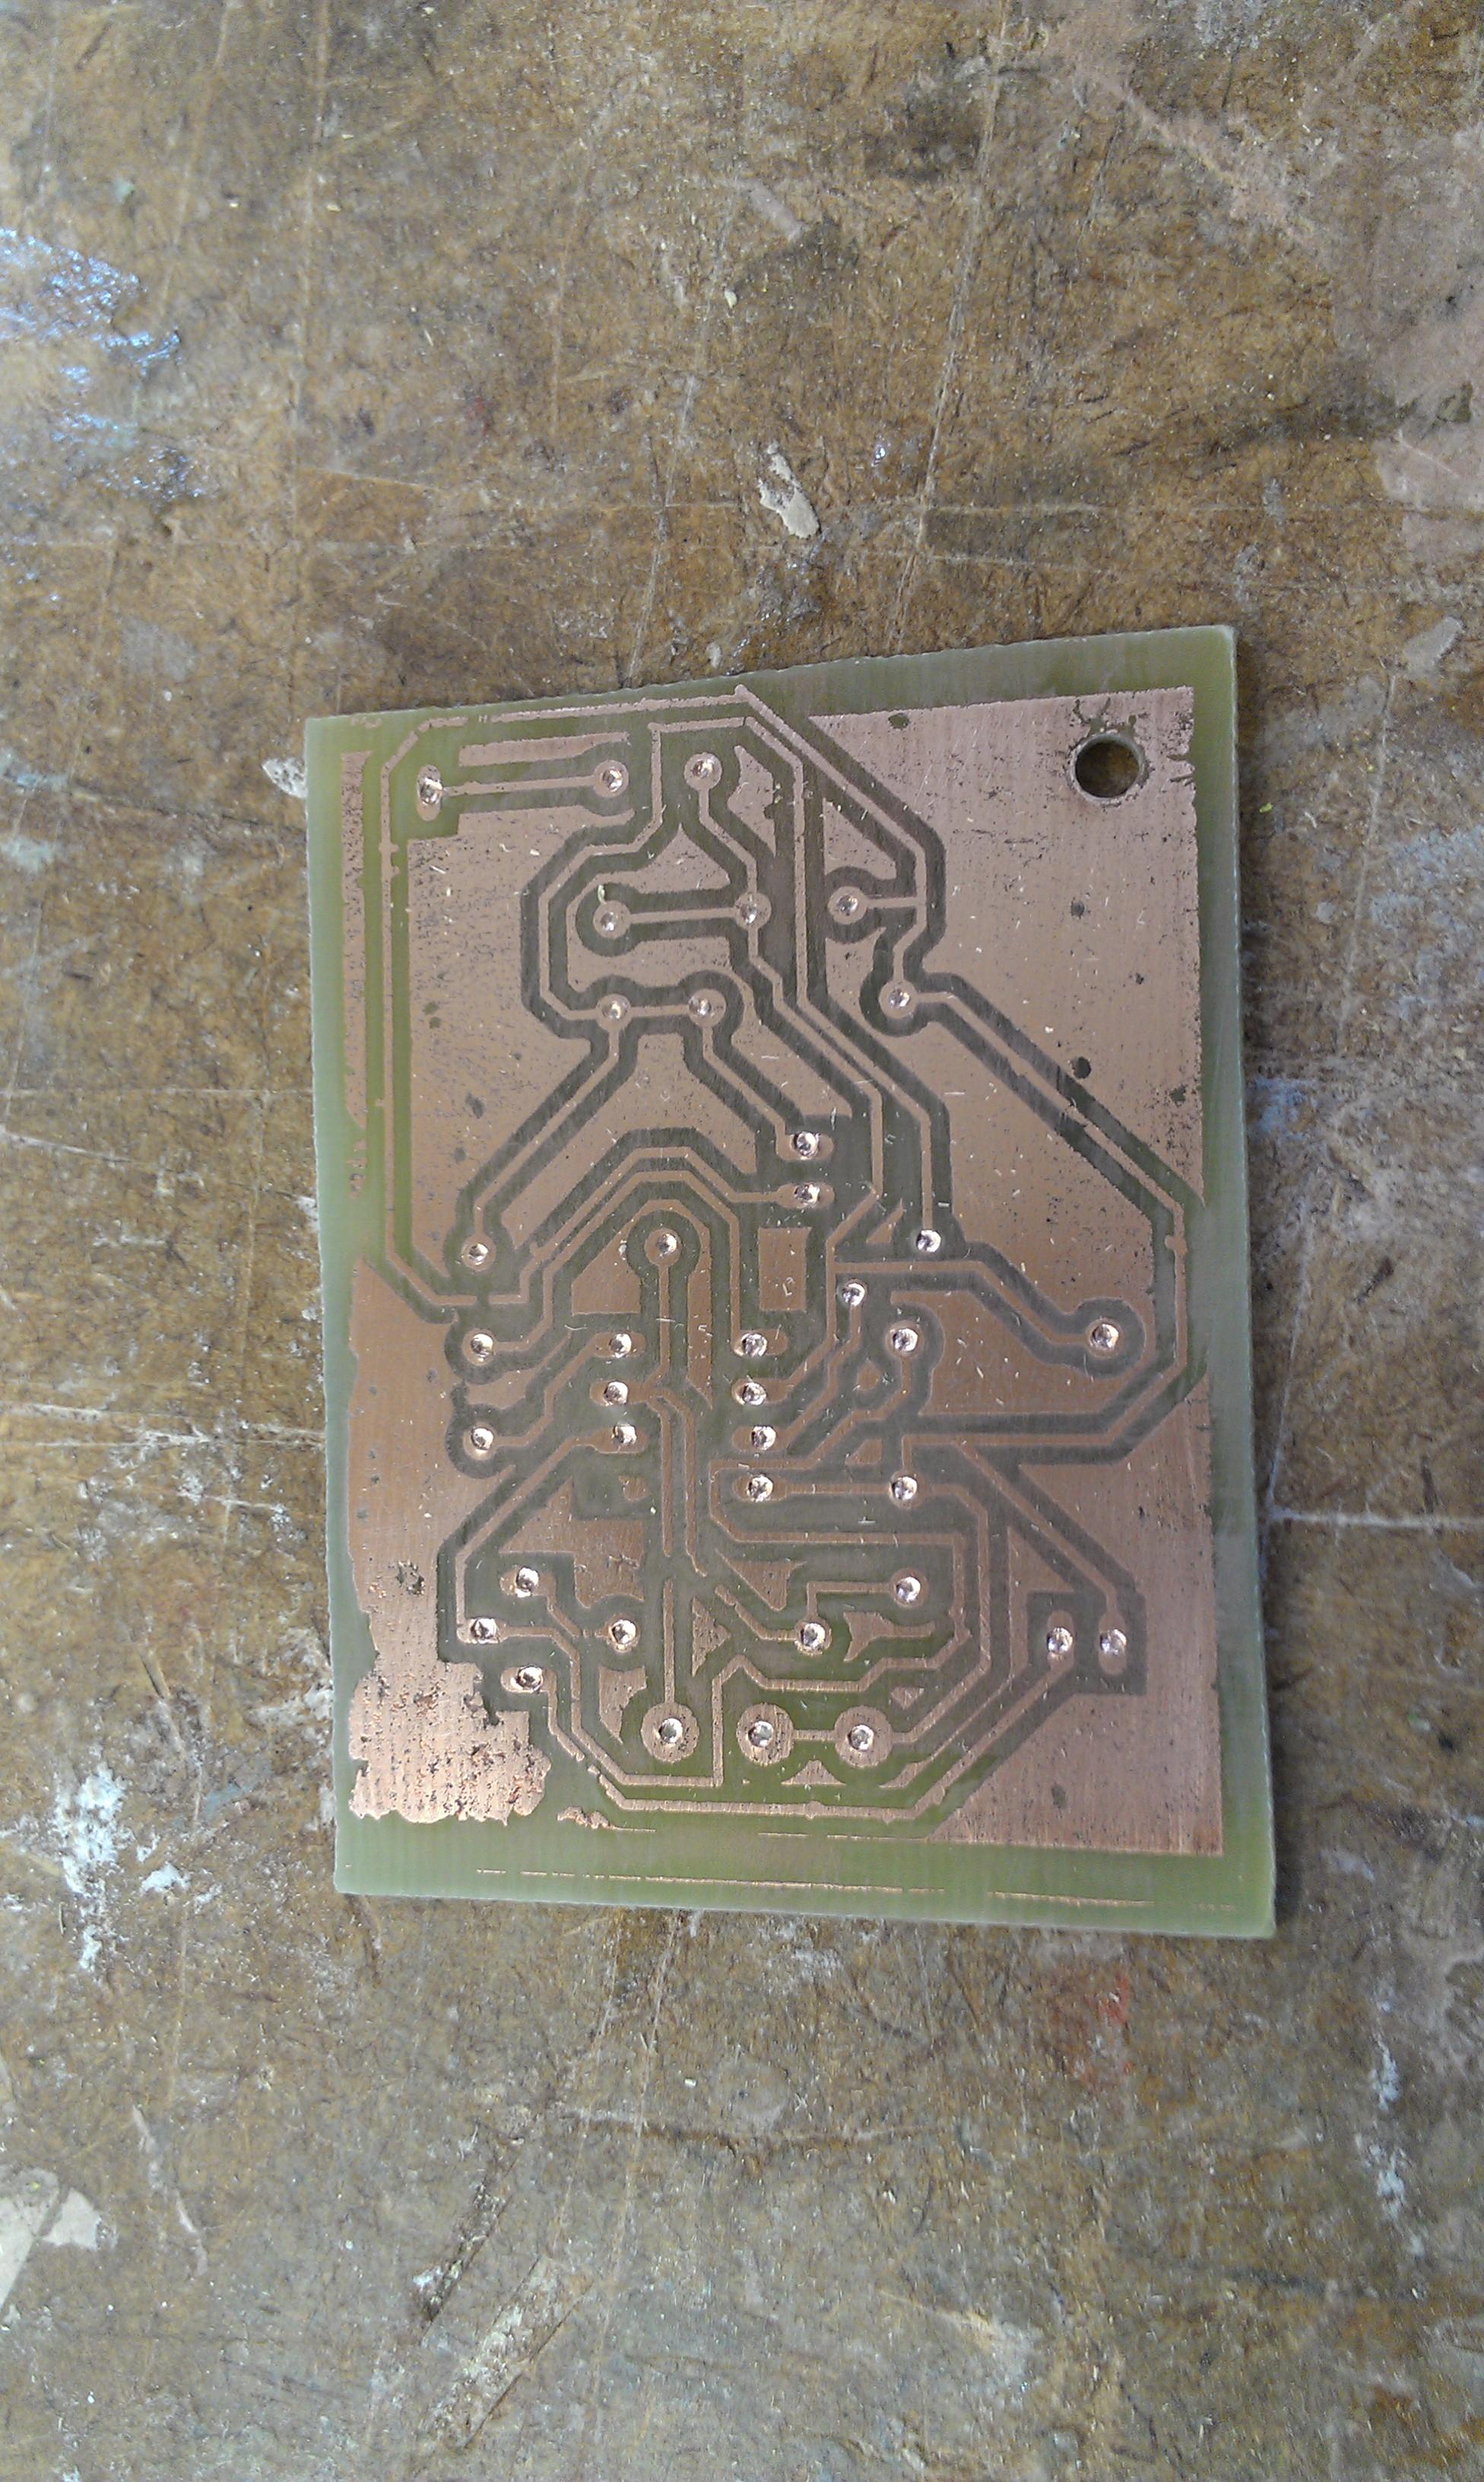 Acid Etching Printed Circuit Boards